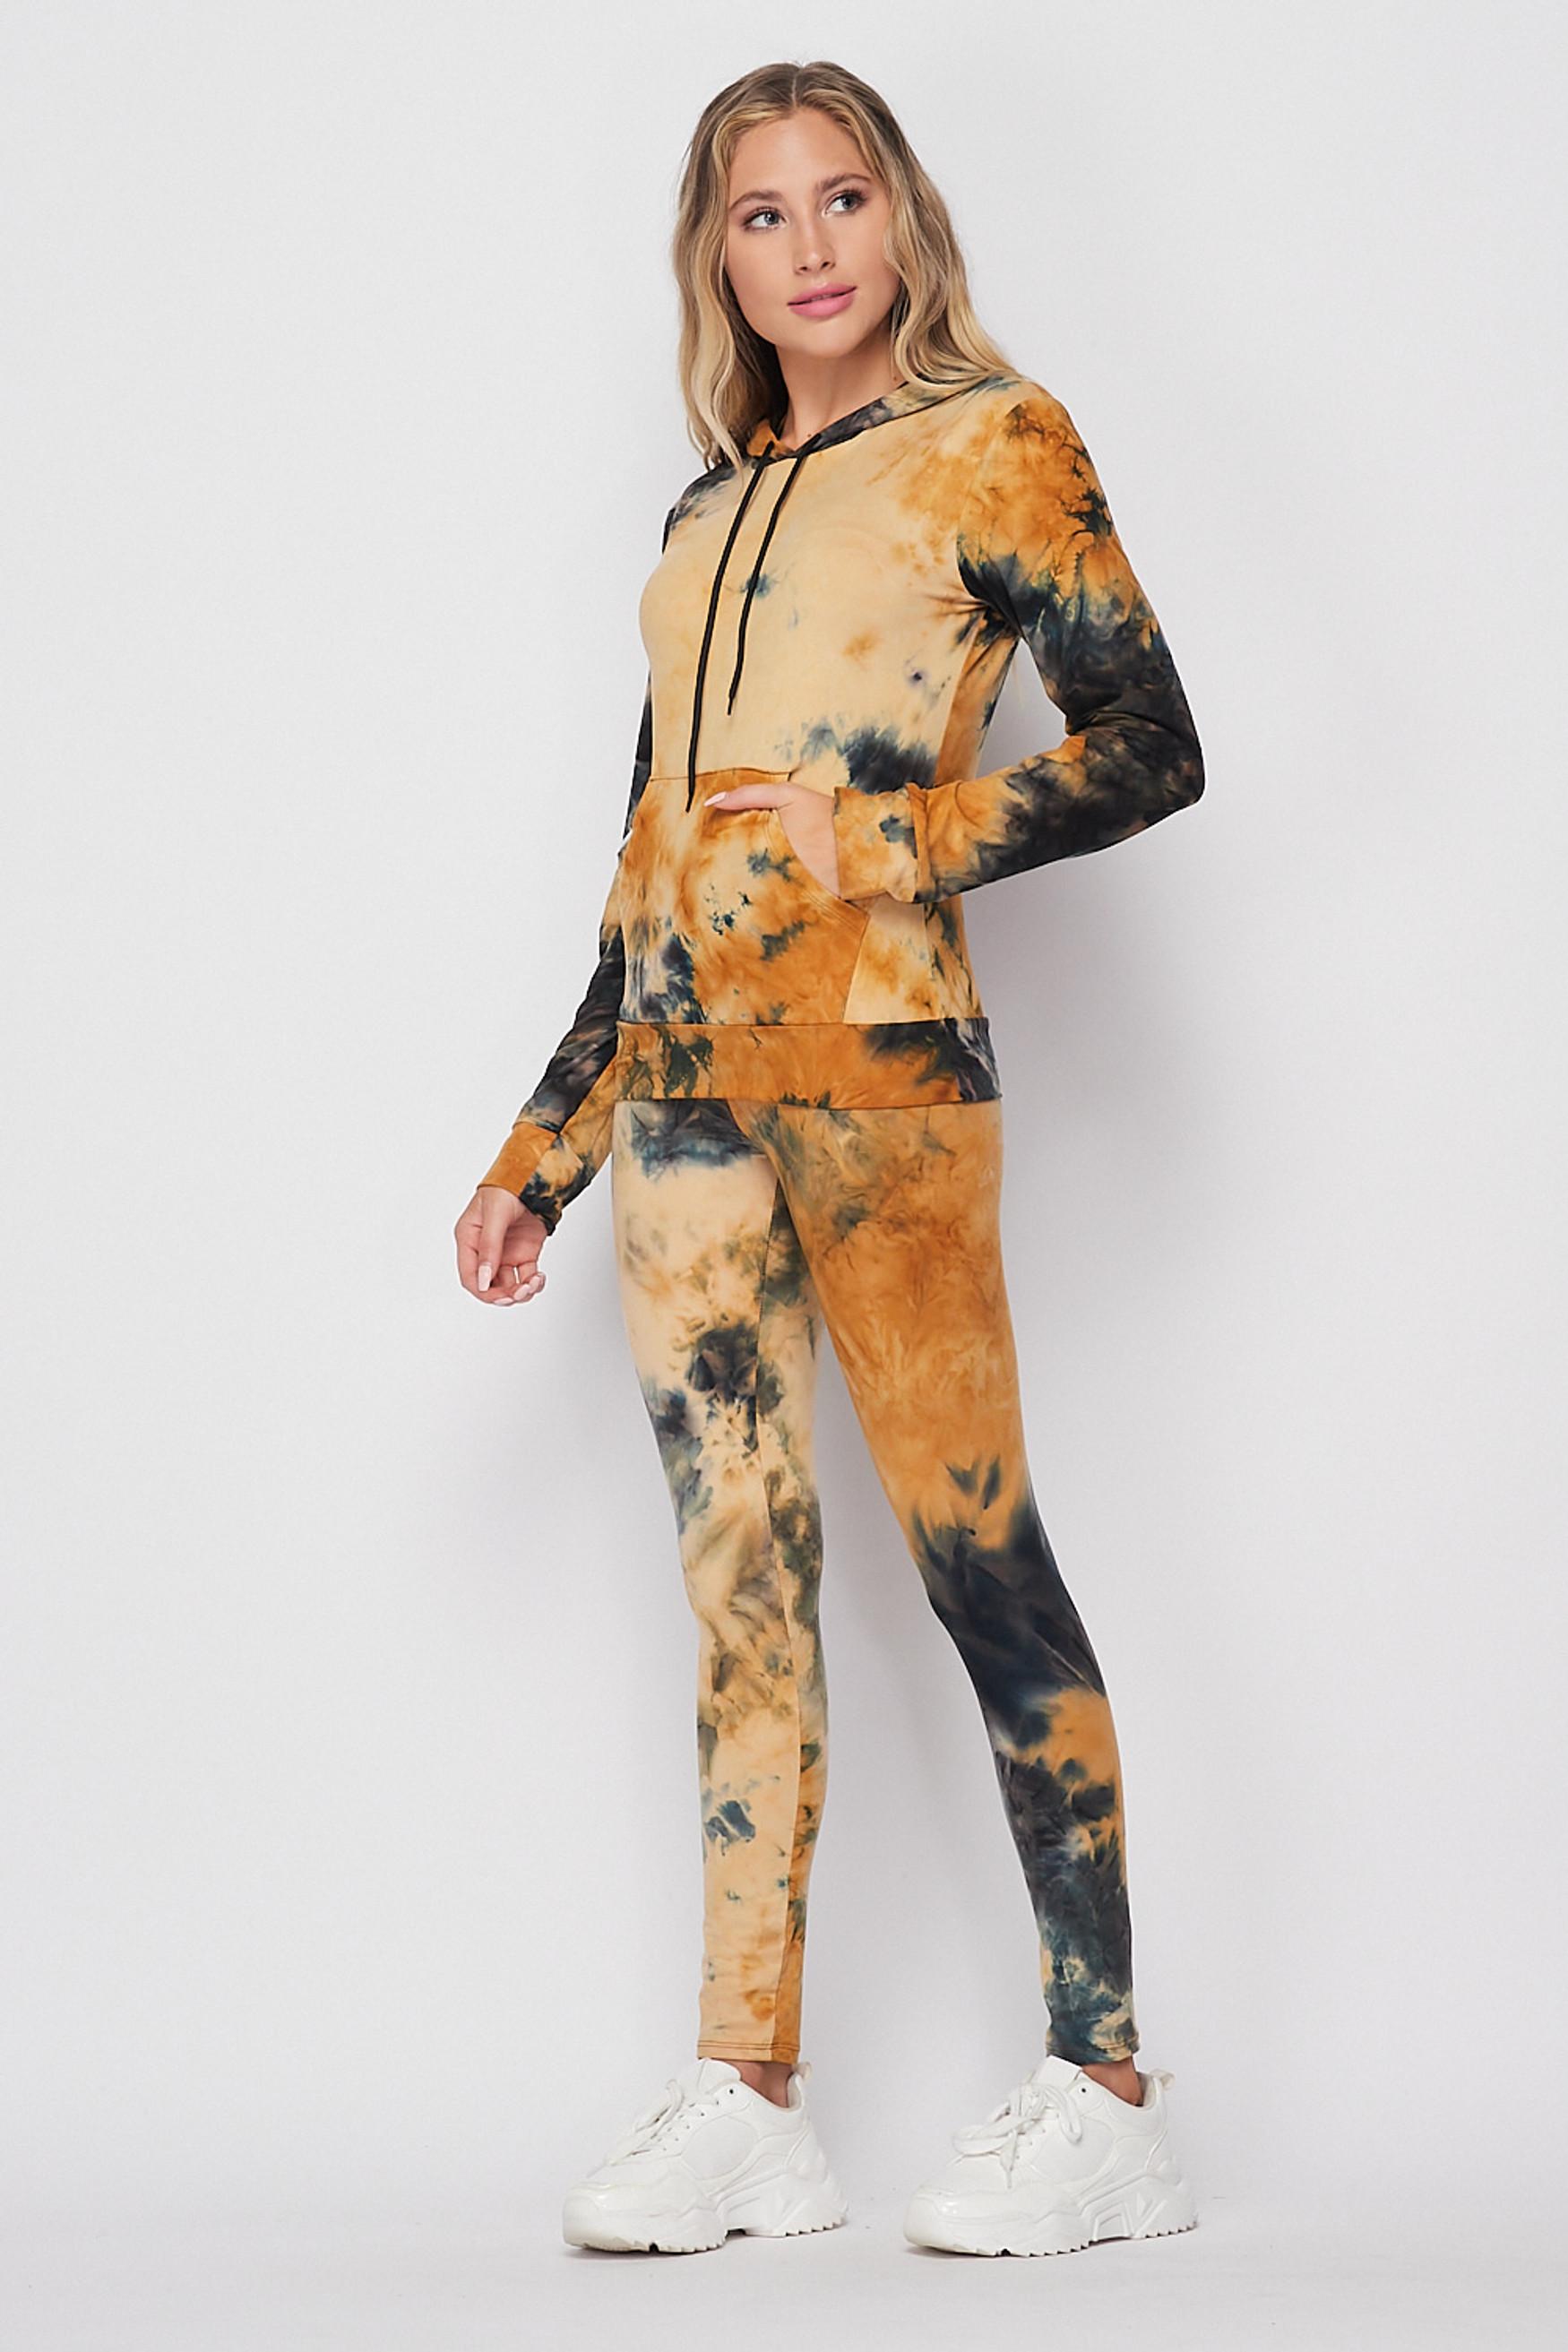 45 degree/left side of Camel Tie Dye 2 Piece Leggings and Hooded Jacket Set